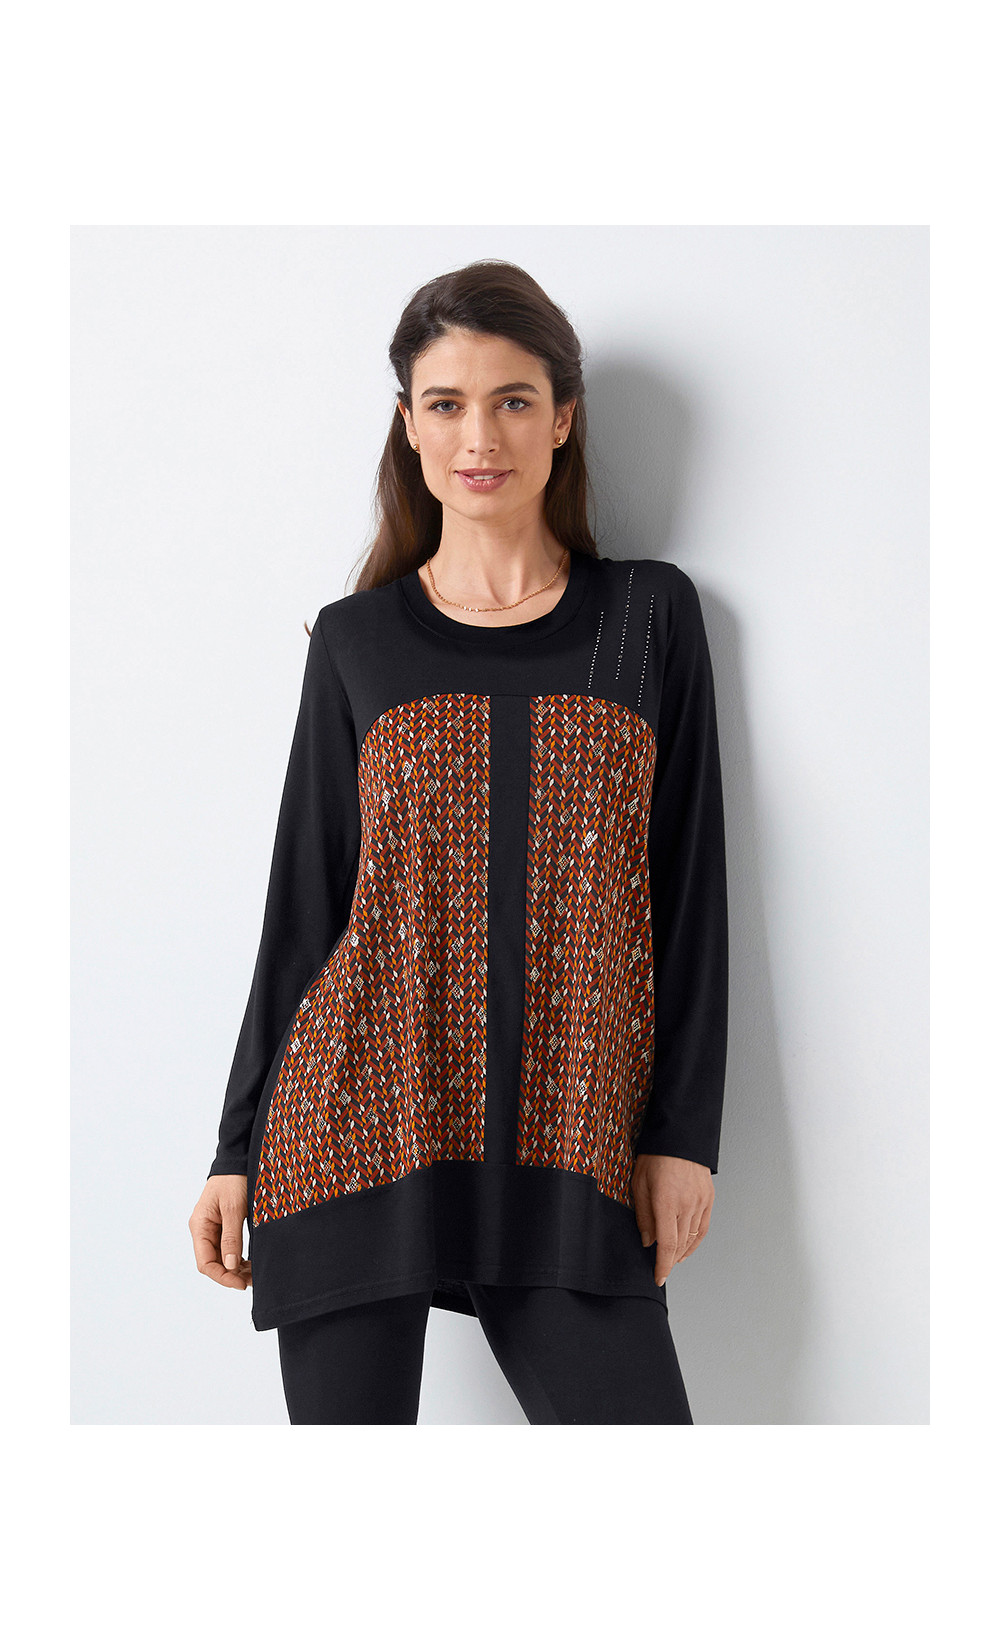 tee-shirt long - CAROMBO